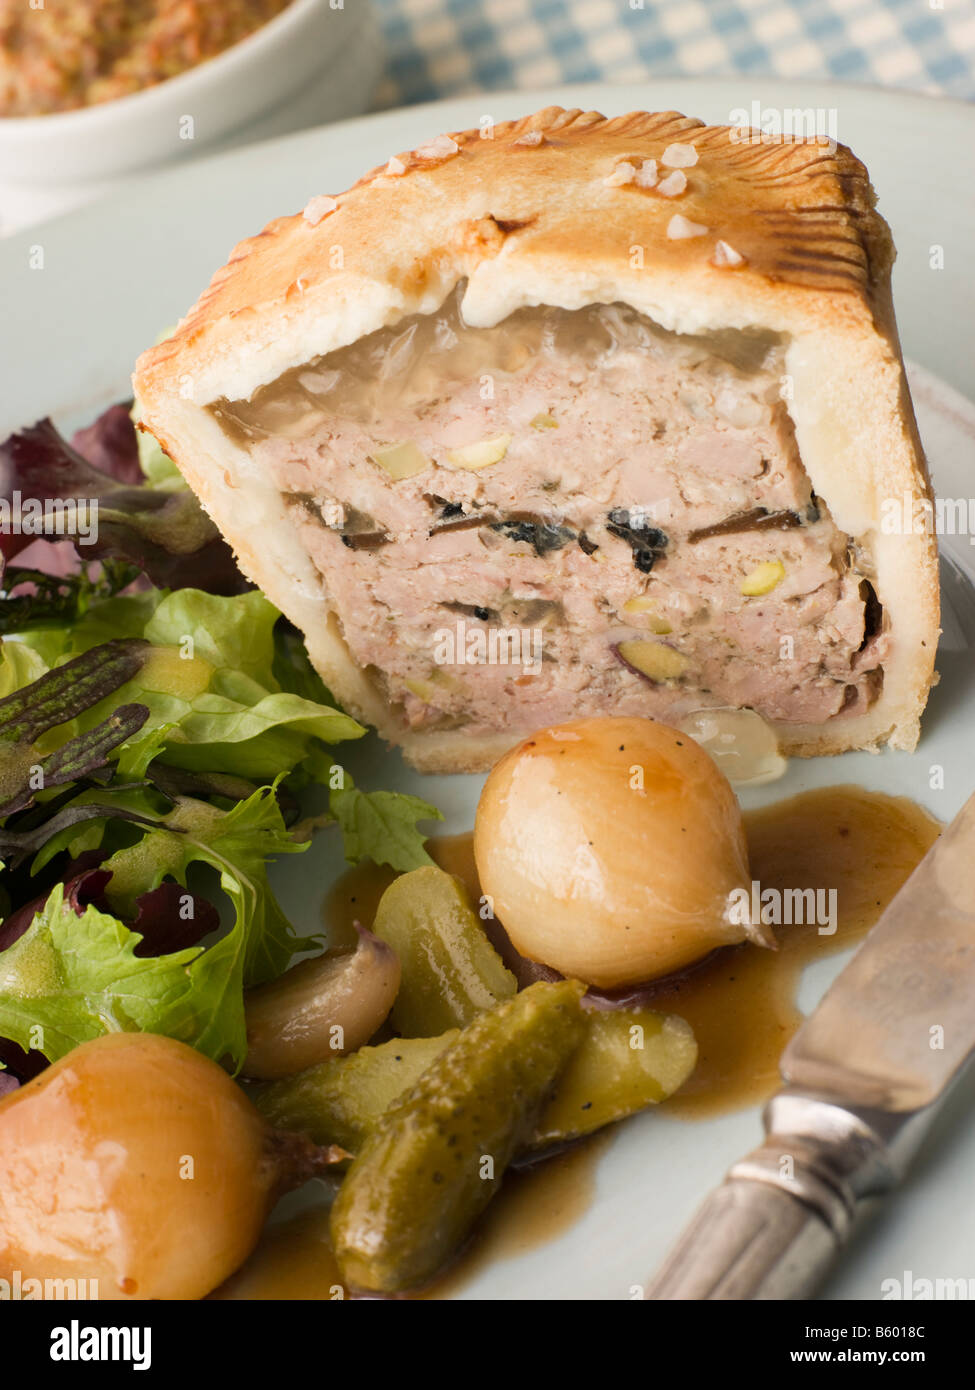 Pork Black Truffle and Pistachio Pie with Glazed Button Onions and Cornichons Stock Photo